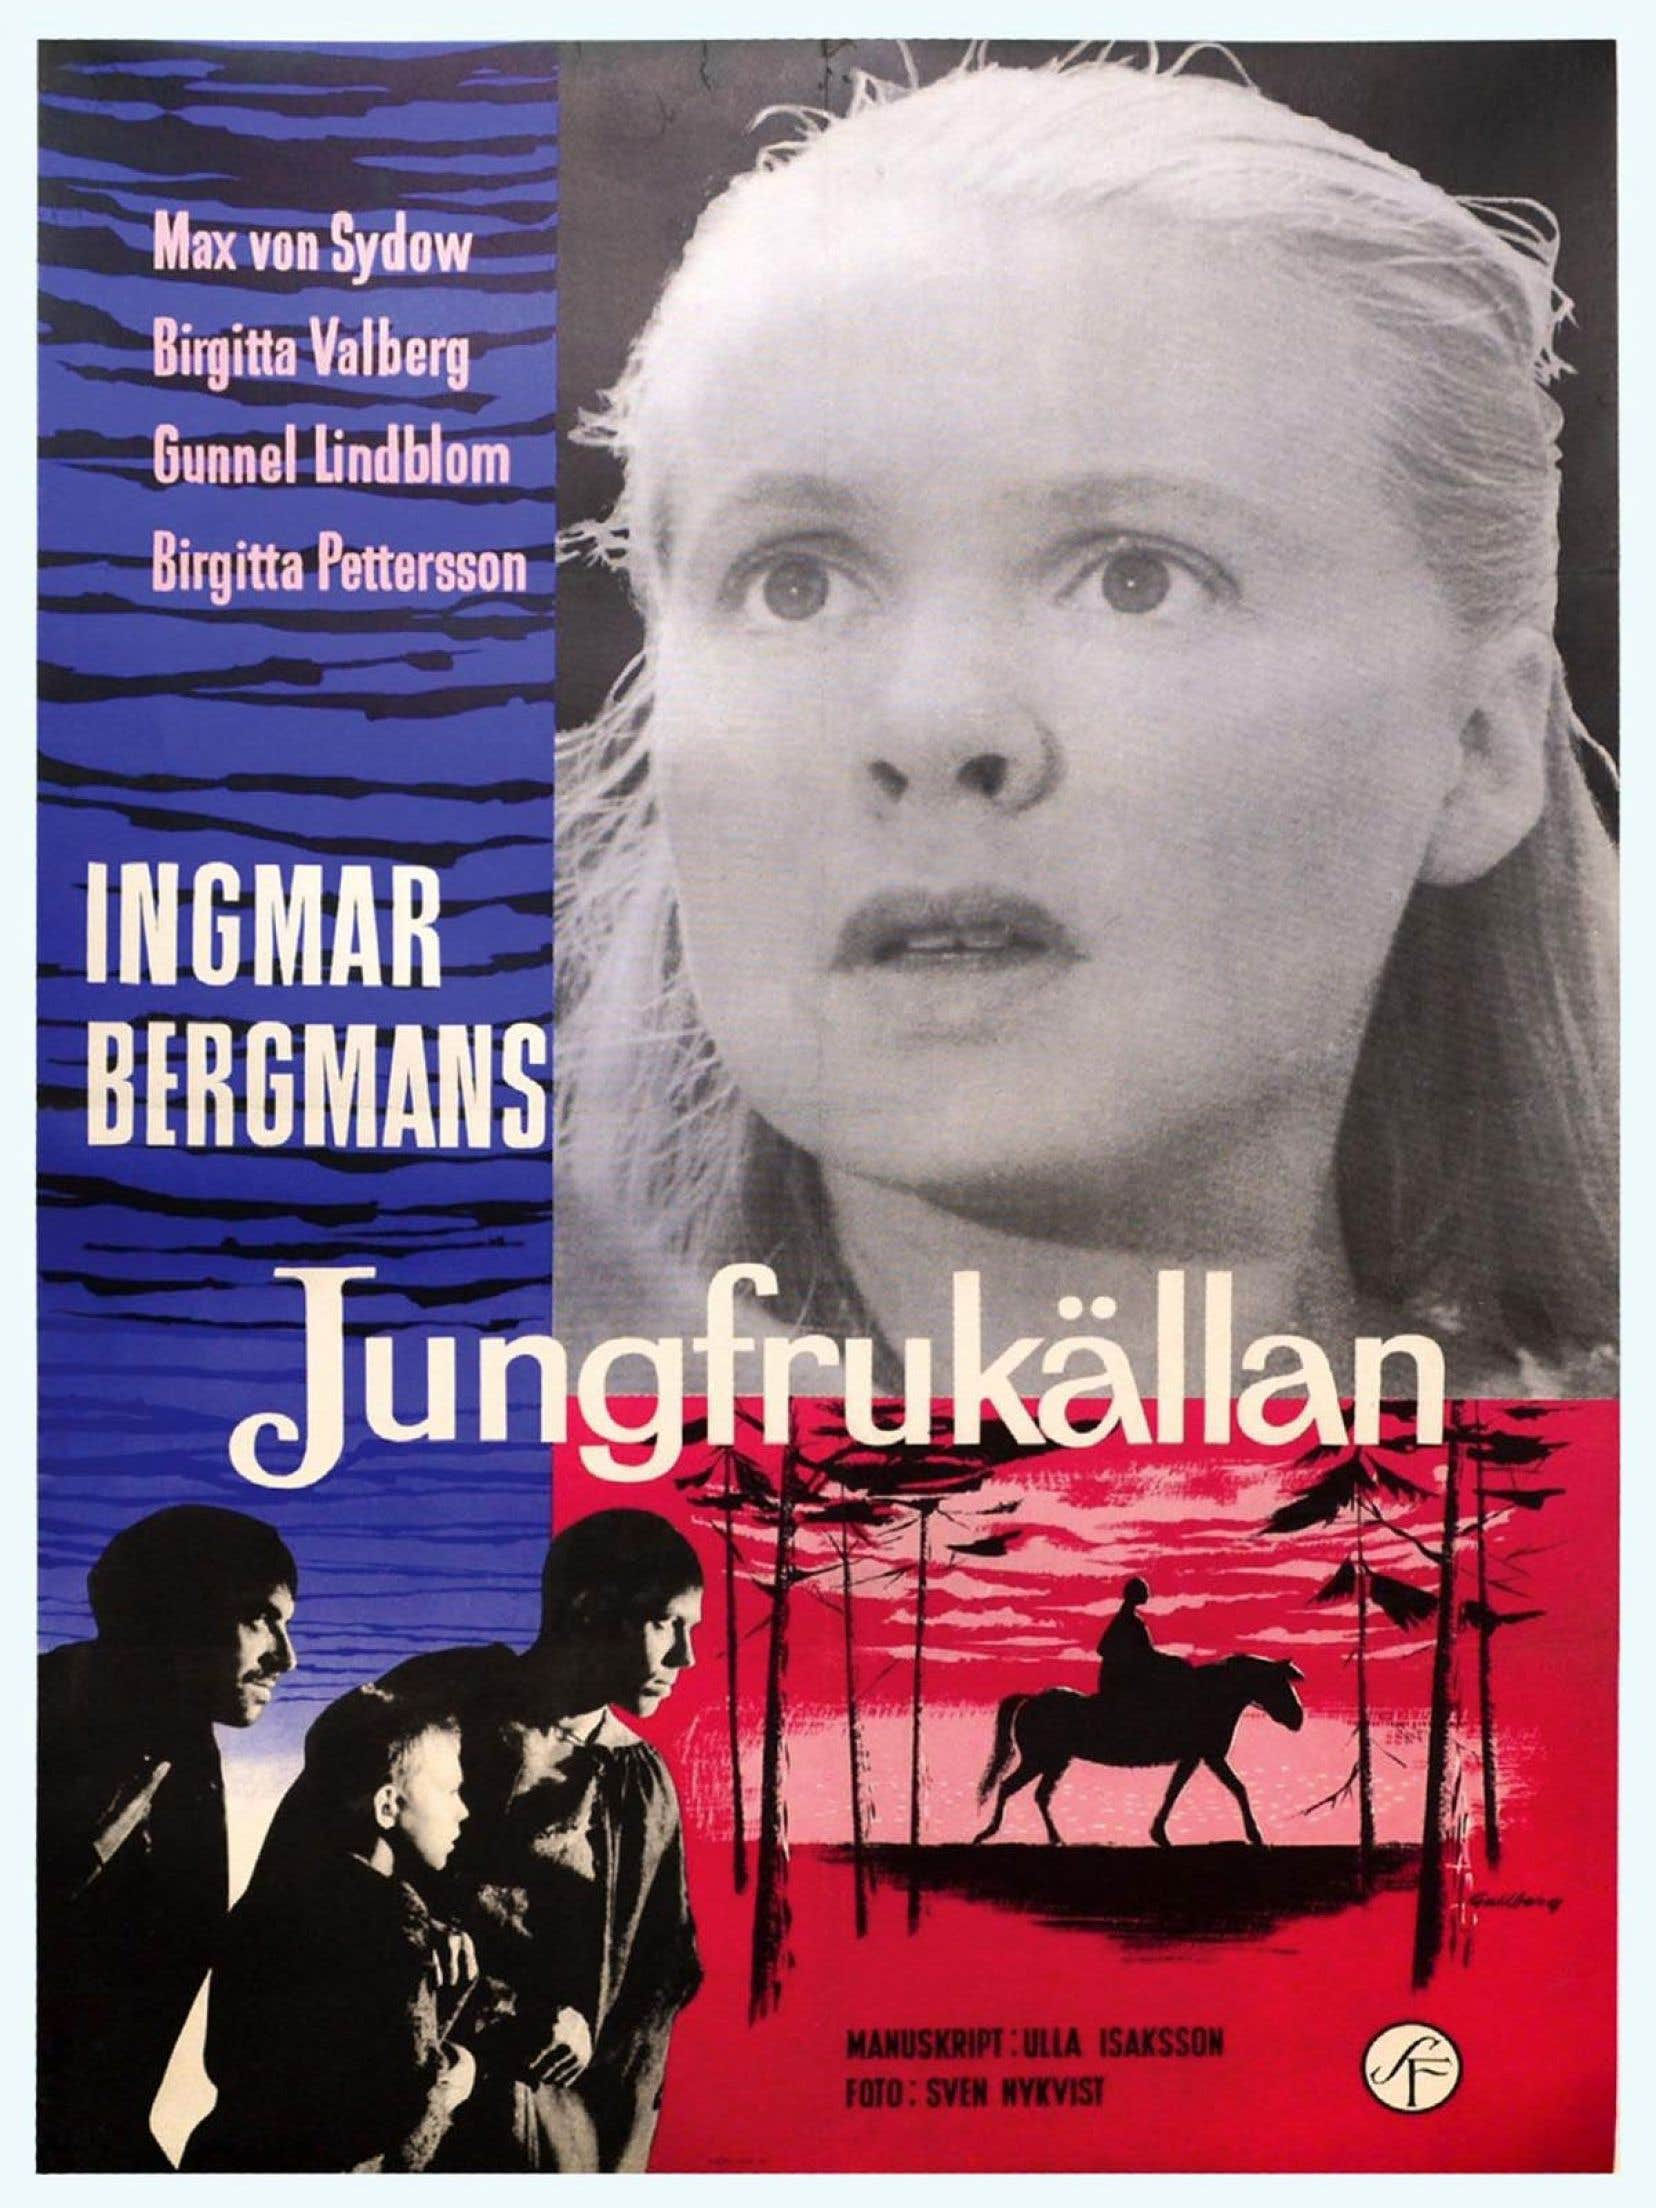 Affiche originale du film «La source», d'Ingmar Bergman